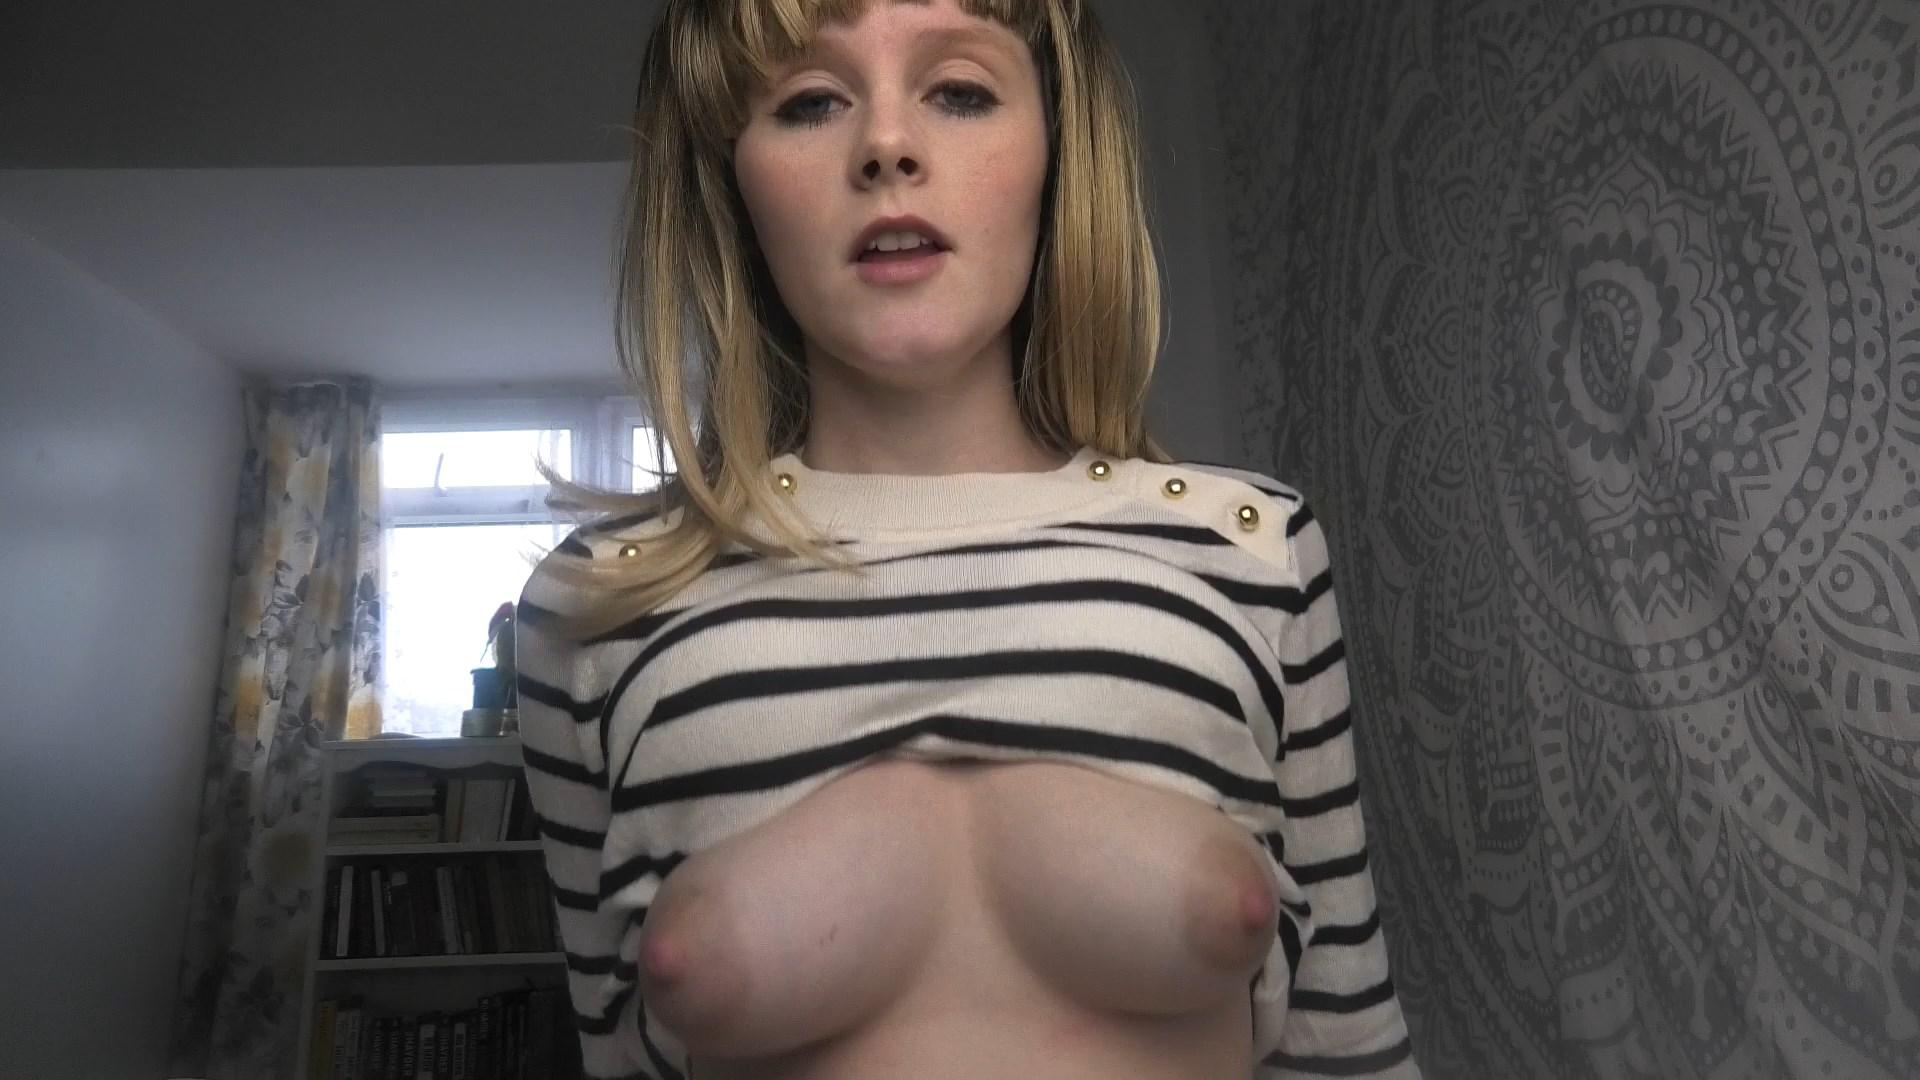 Sydney Harwin - Devious Mom